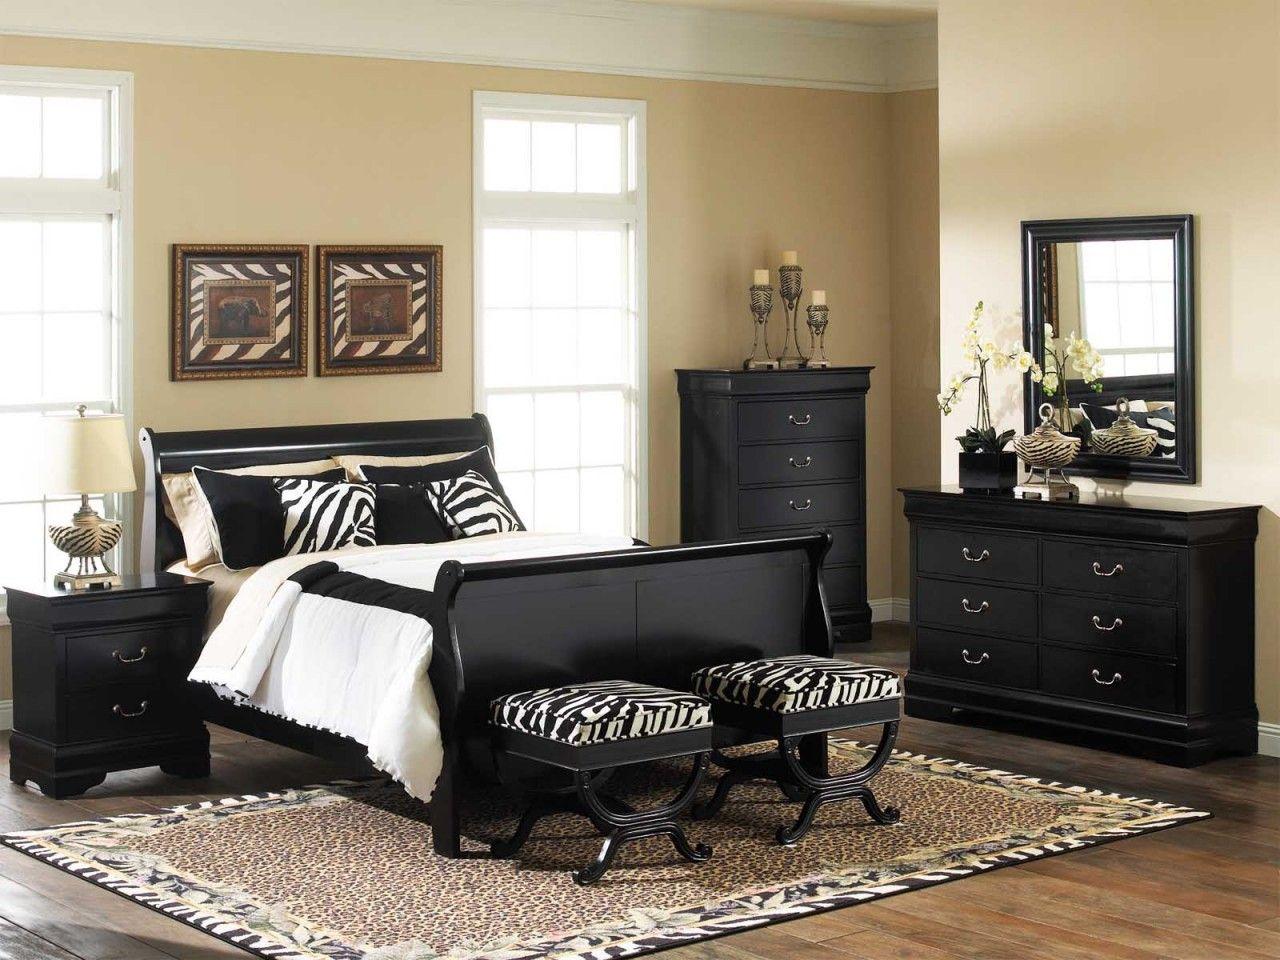 Bedroom Interior Design India   Bedroom | Bedroom Design | Bedroom Design  Ideas | Pinterest | Room Decorating Ideas, Small Rooms And Bedrooms